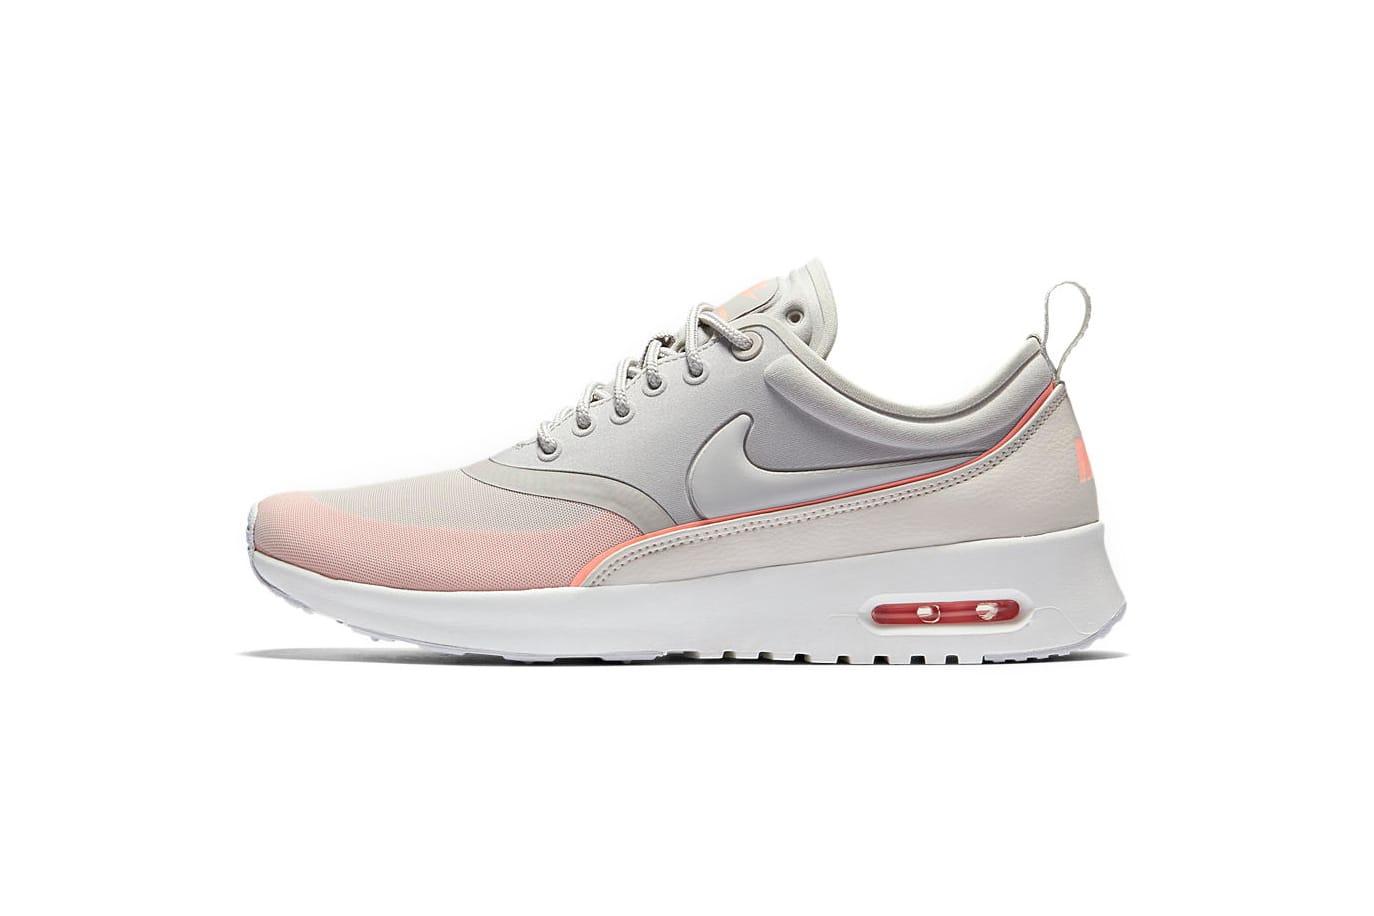 Nike Flavors Air Max Thea Ultra in Peaches and Cream